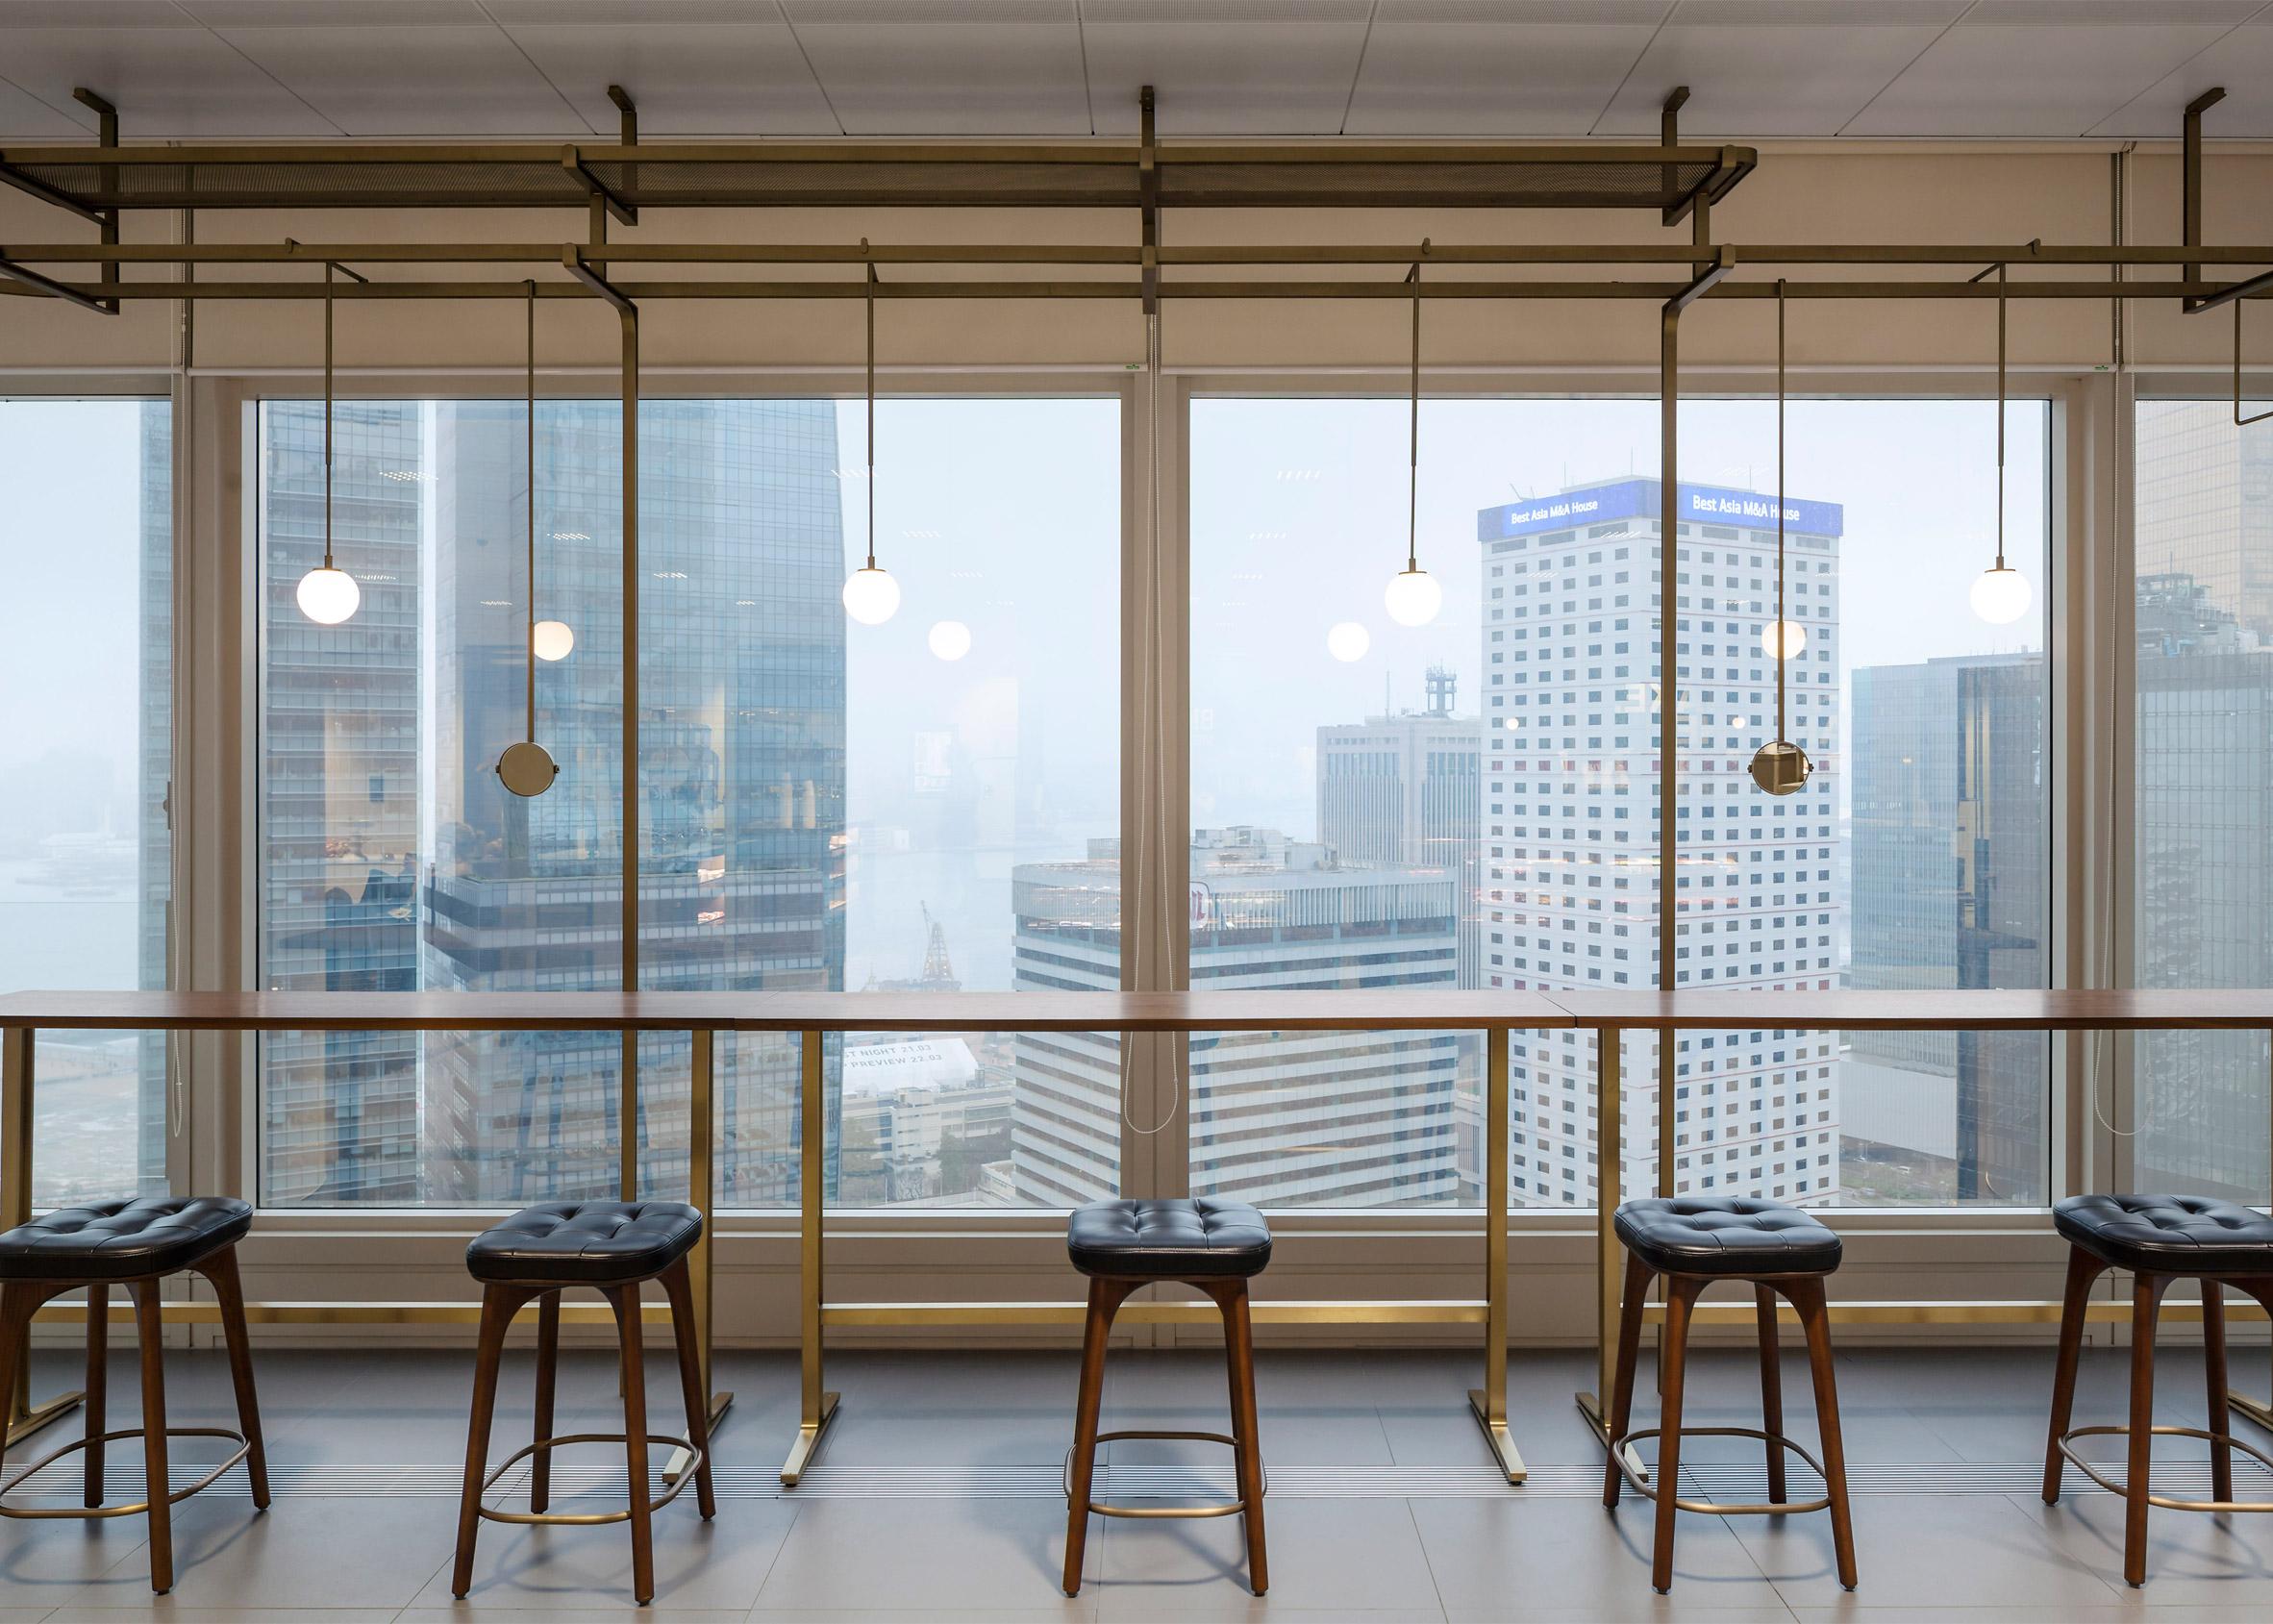 Bloomberg Hong Kong Office by Neri&Hu